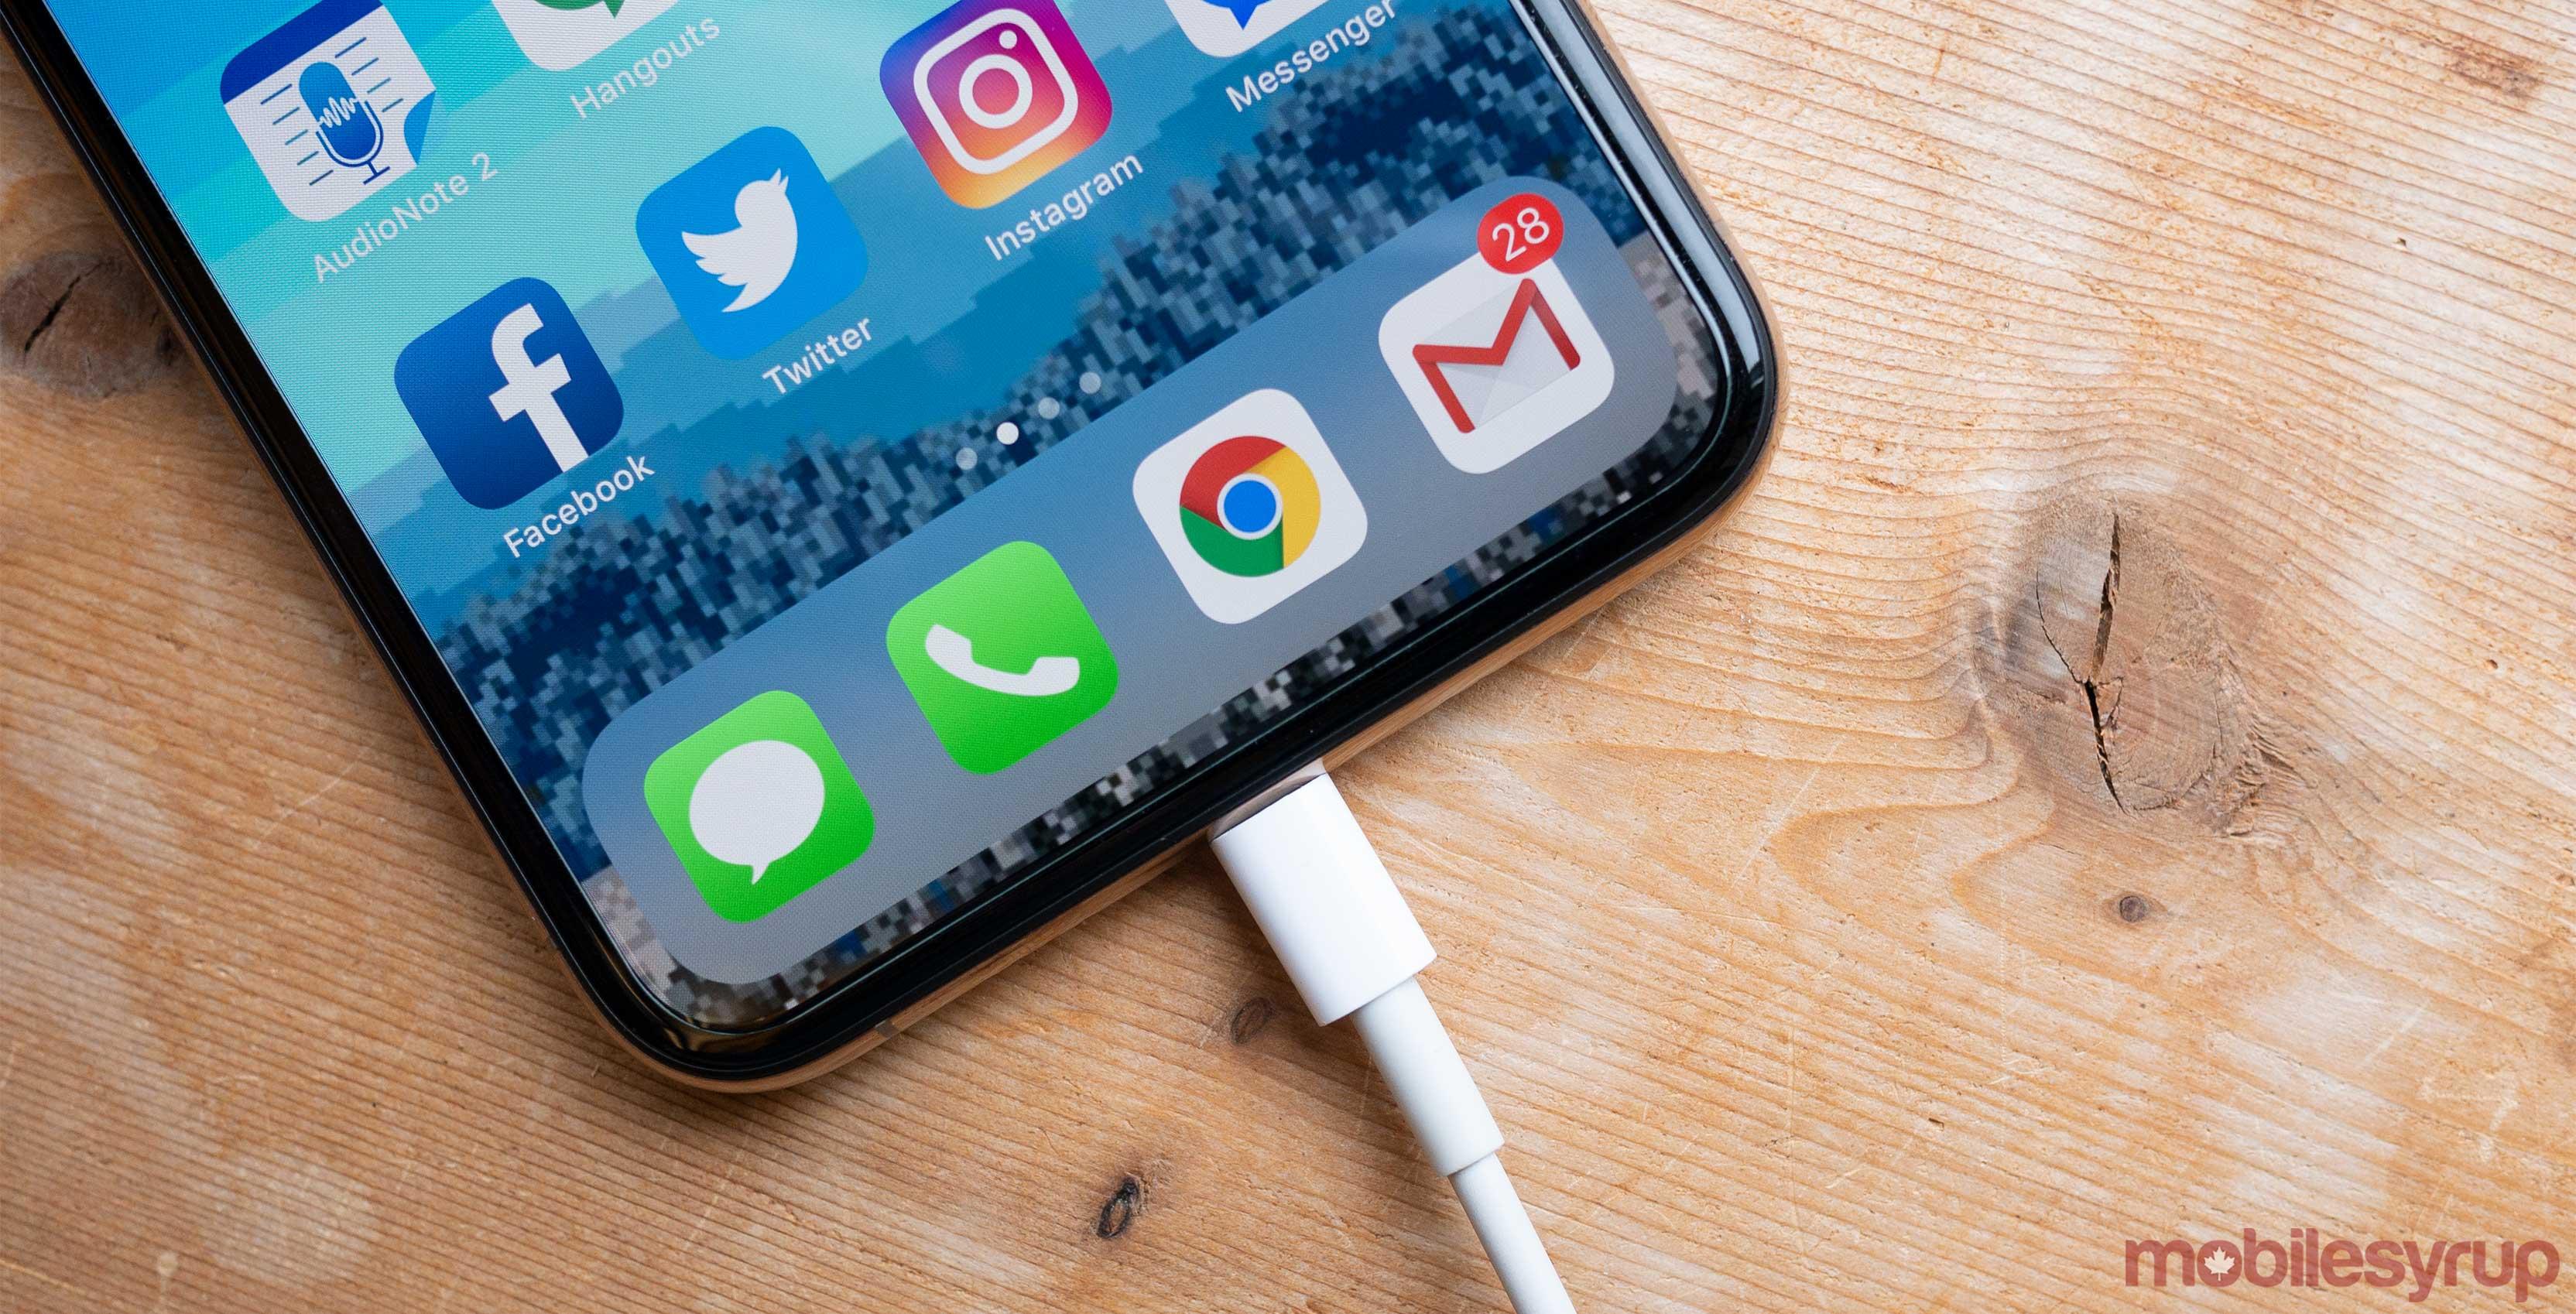 iPhone XS Lightning port